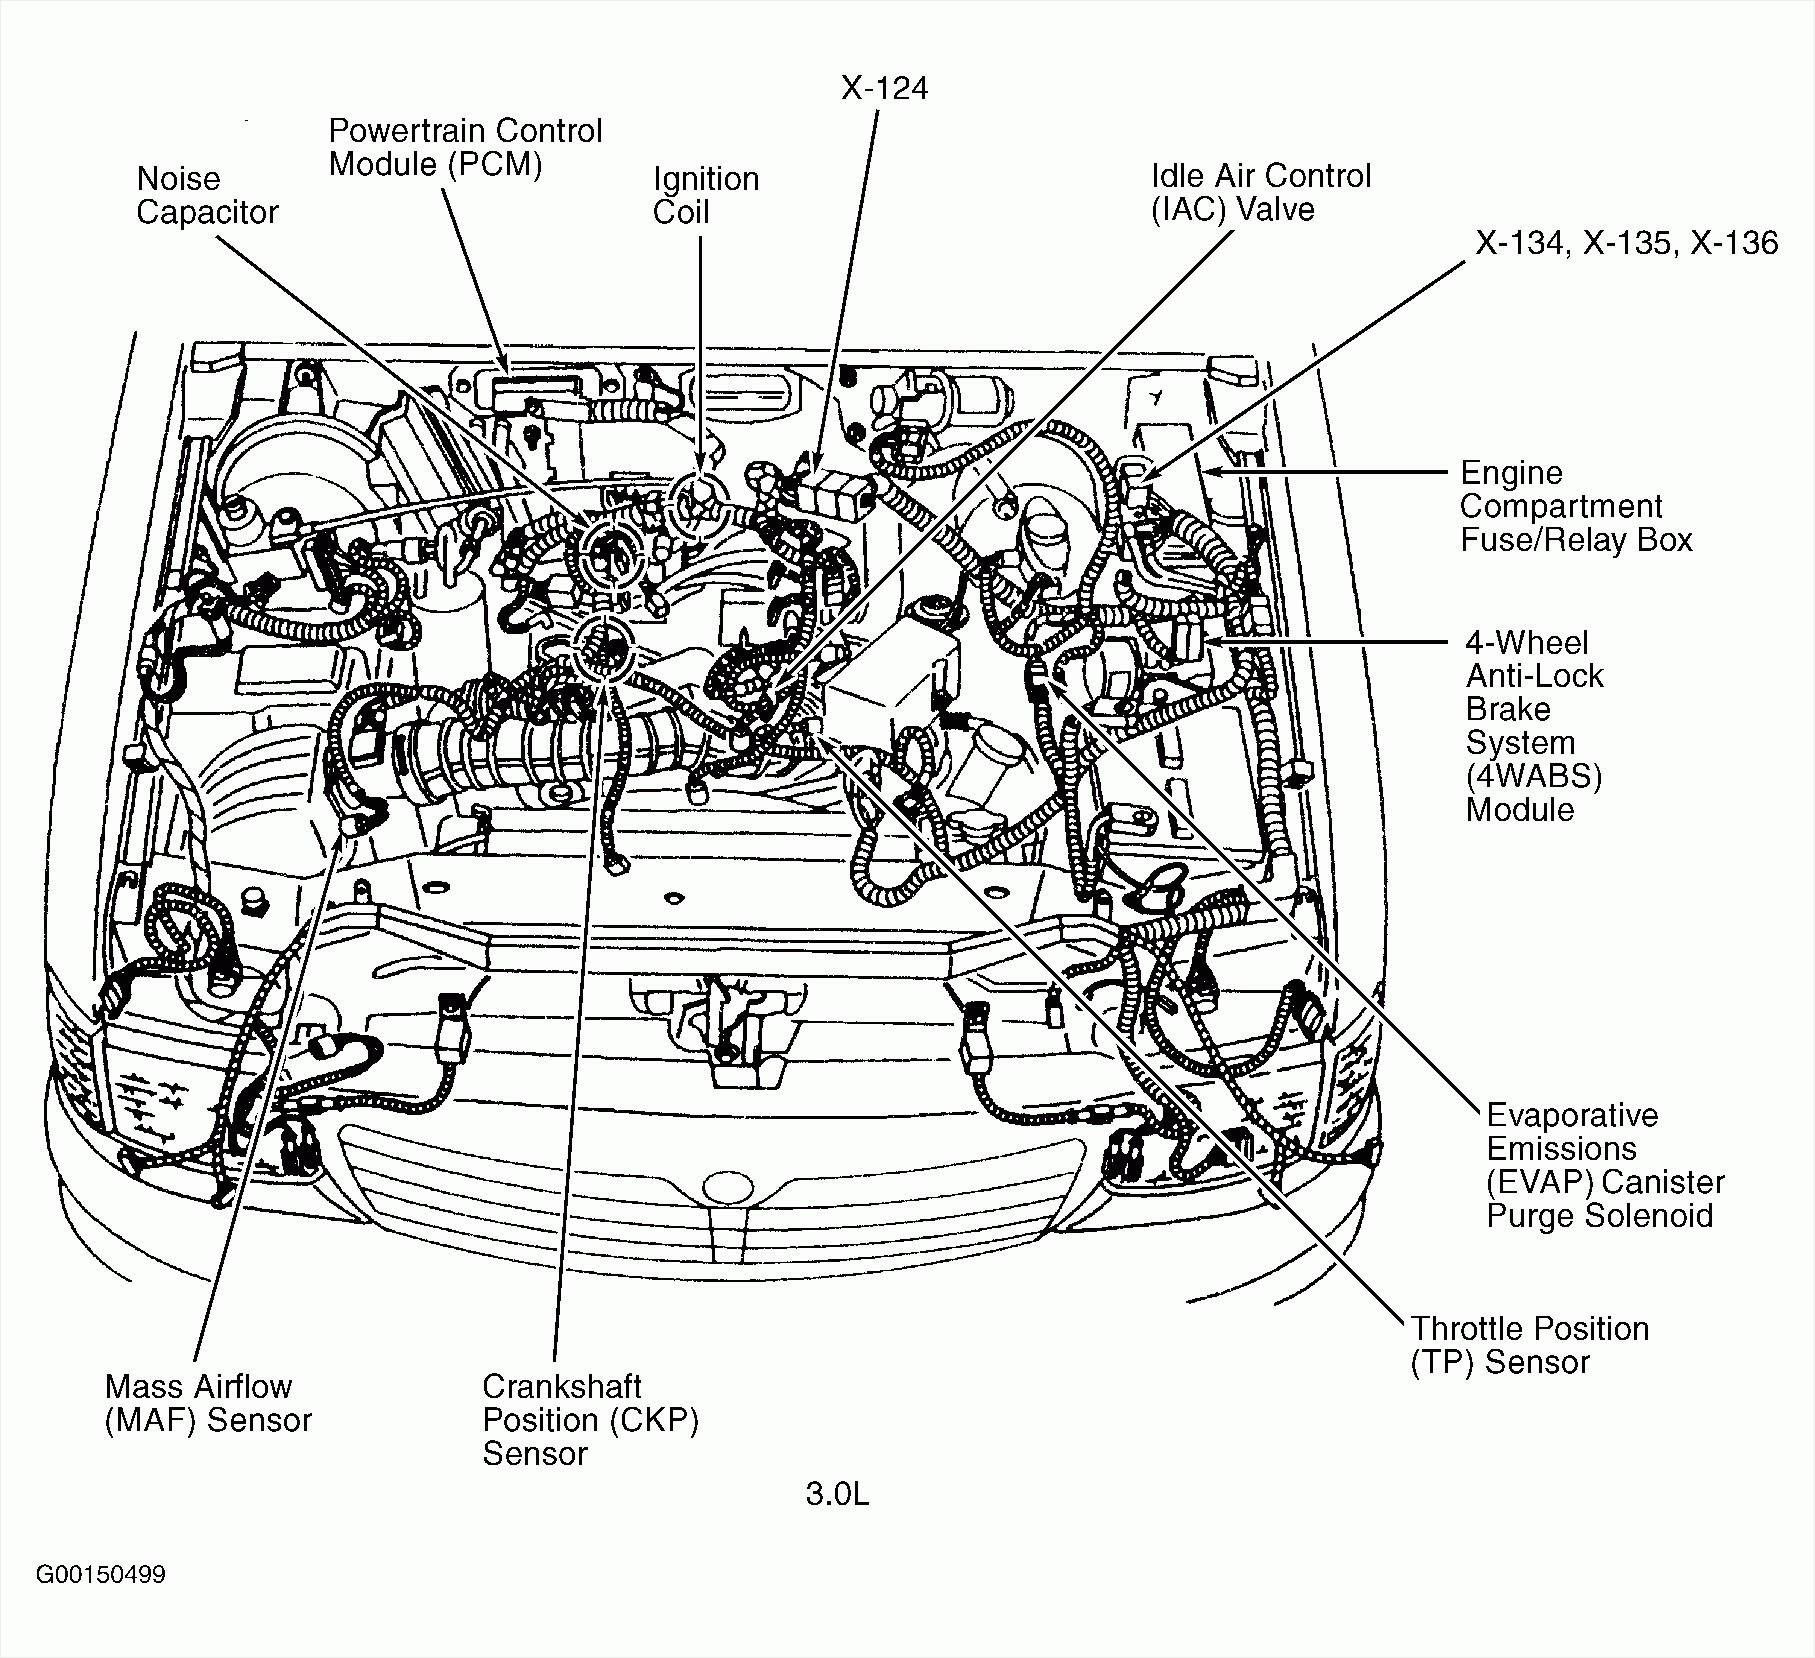 1990 toyota Camry Engine Diagram 92 toyota Truck Wiring Schematic Of 1990 toyota Camry Engine Diagram